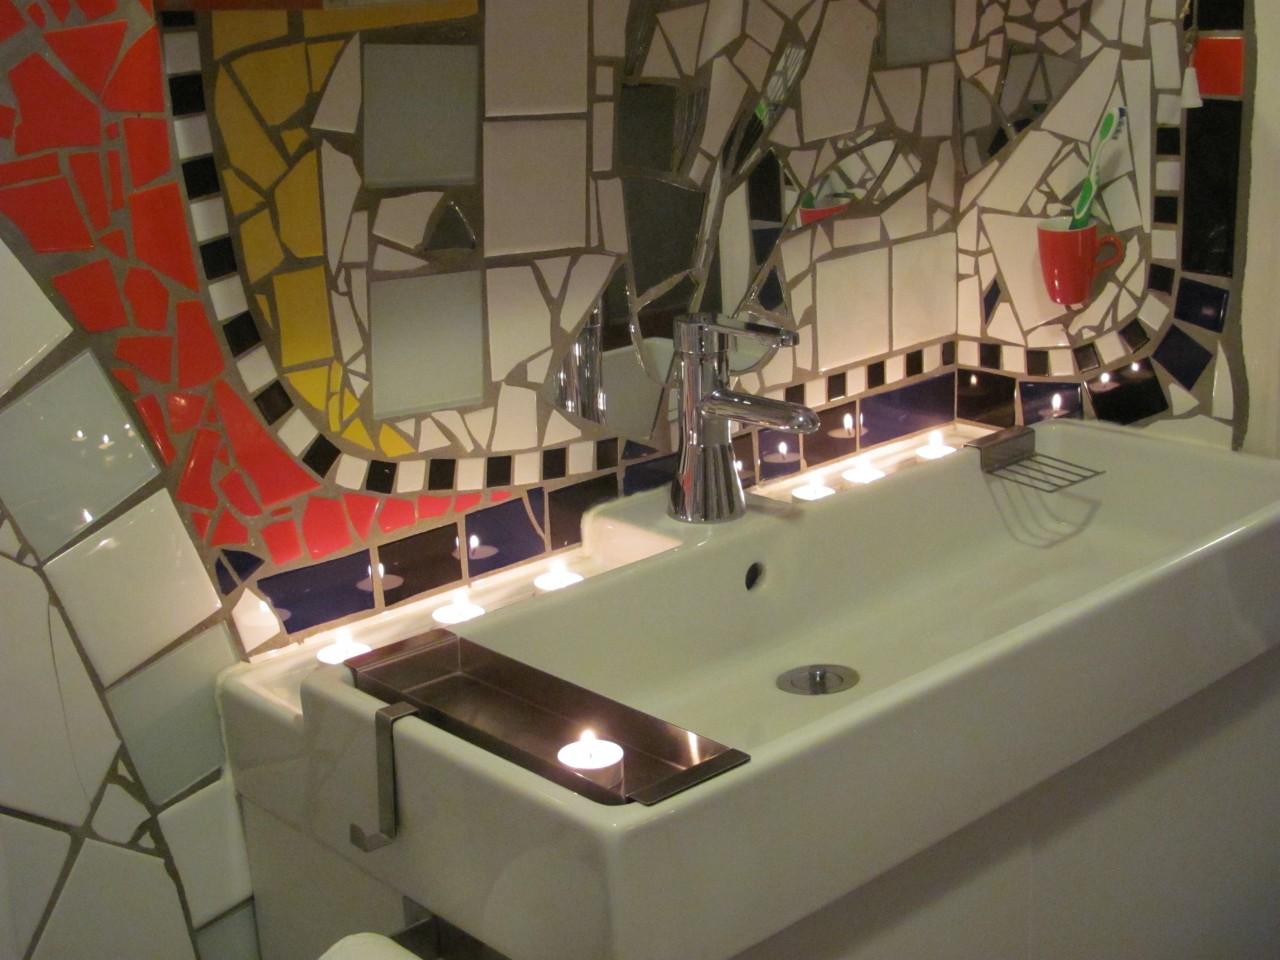 Kunststof Tegels Praxis : Kunstof tegels praxis: de prettig praxis tegels badkamer denkbeeld